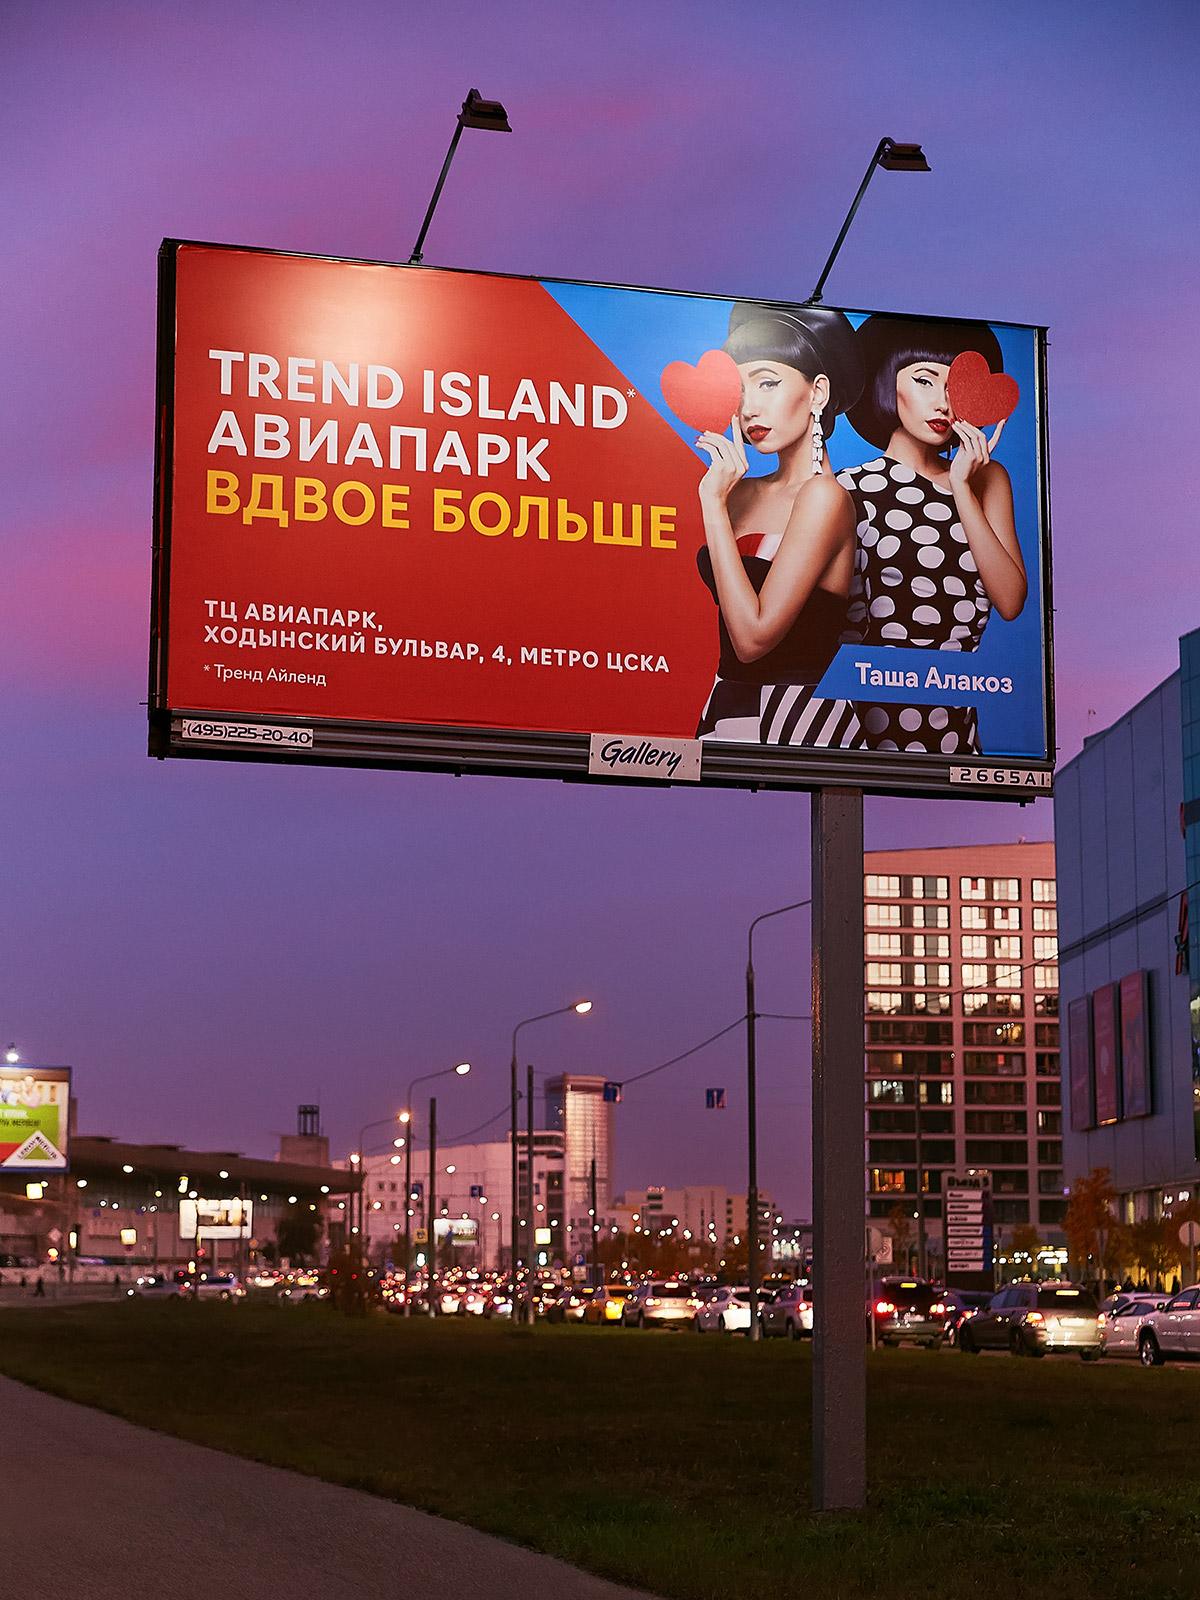 Реклама универмага Trend Island, ТЦ Авиапарк с Ташей Алакоз. Фотограф: Александр Сакулин